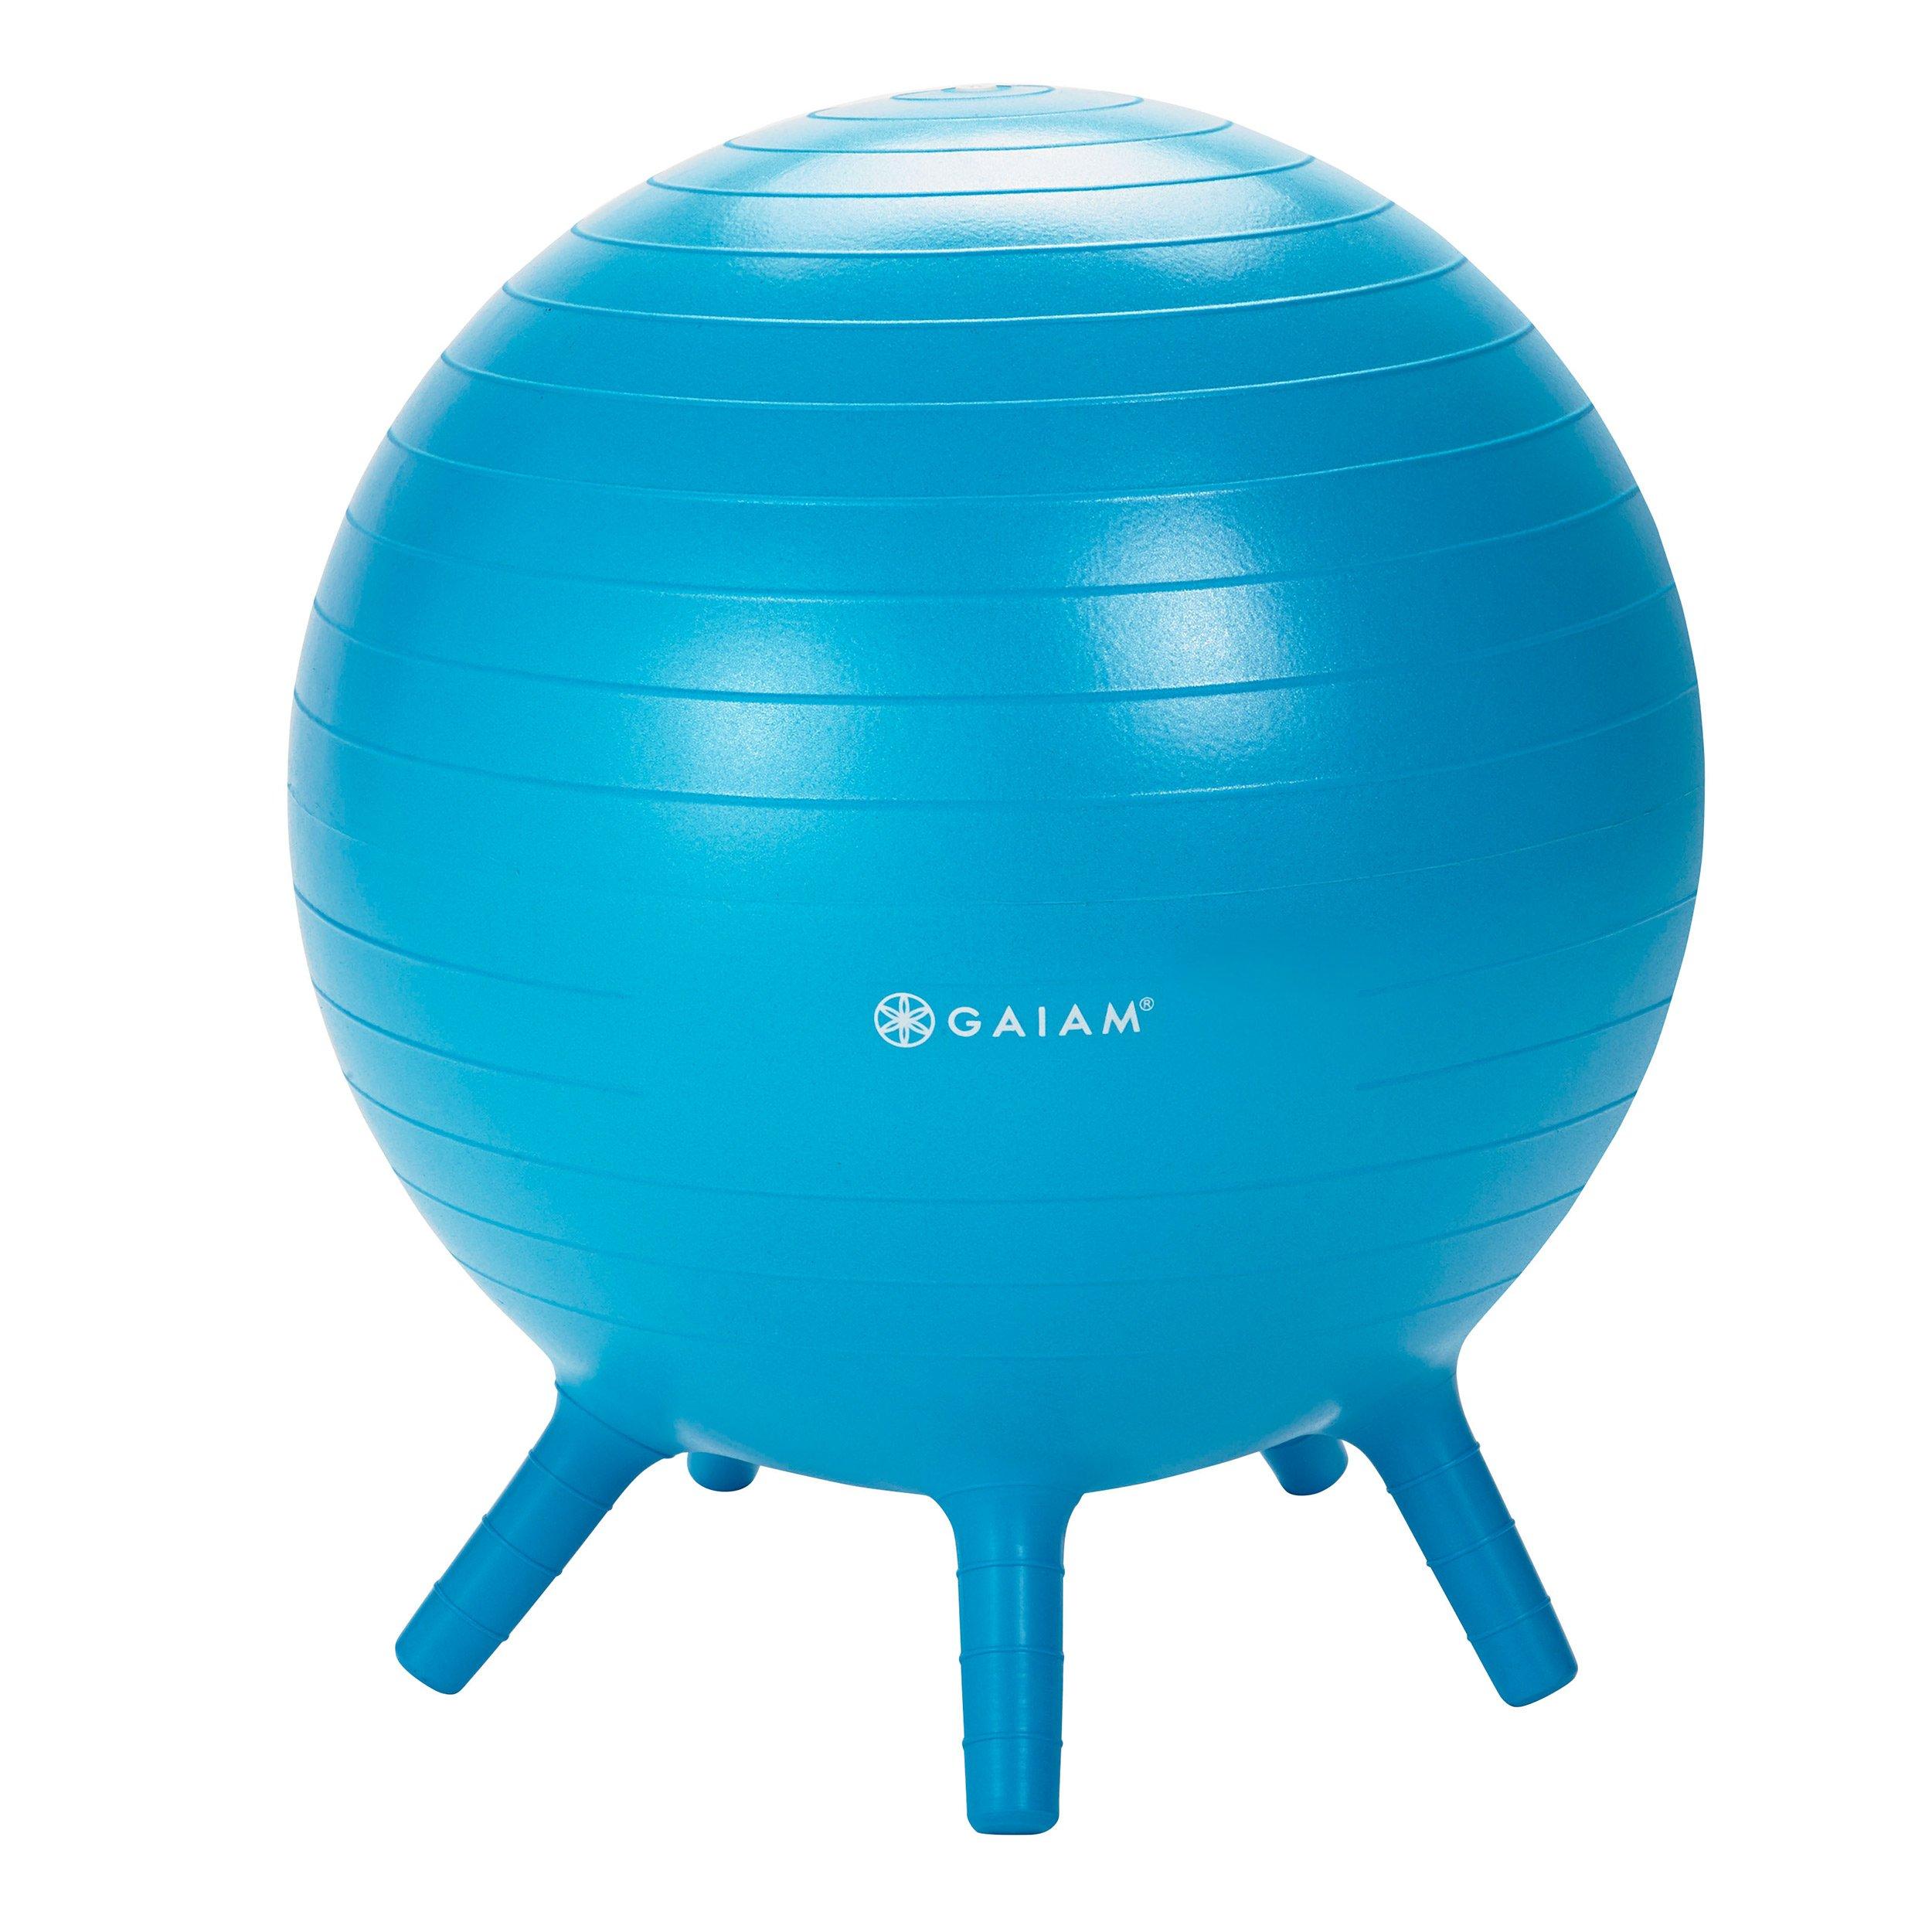 Amazon.com: Balance Ball Chair - Child Size - Blue: Beauty